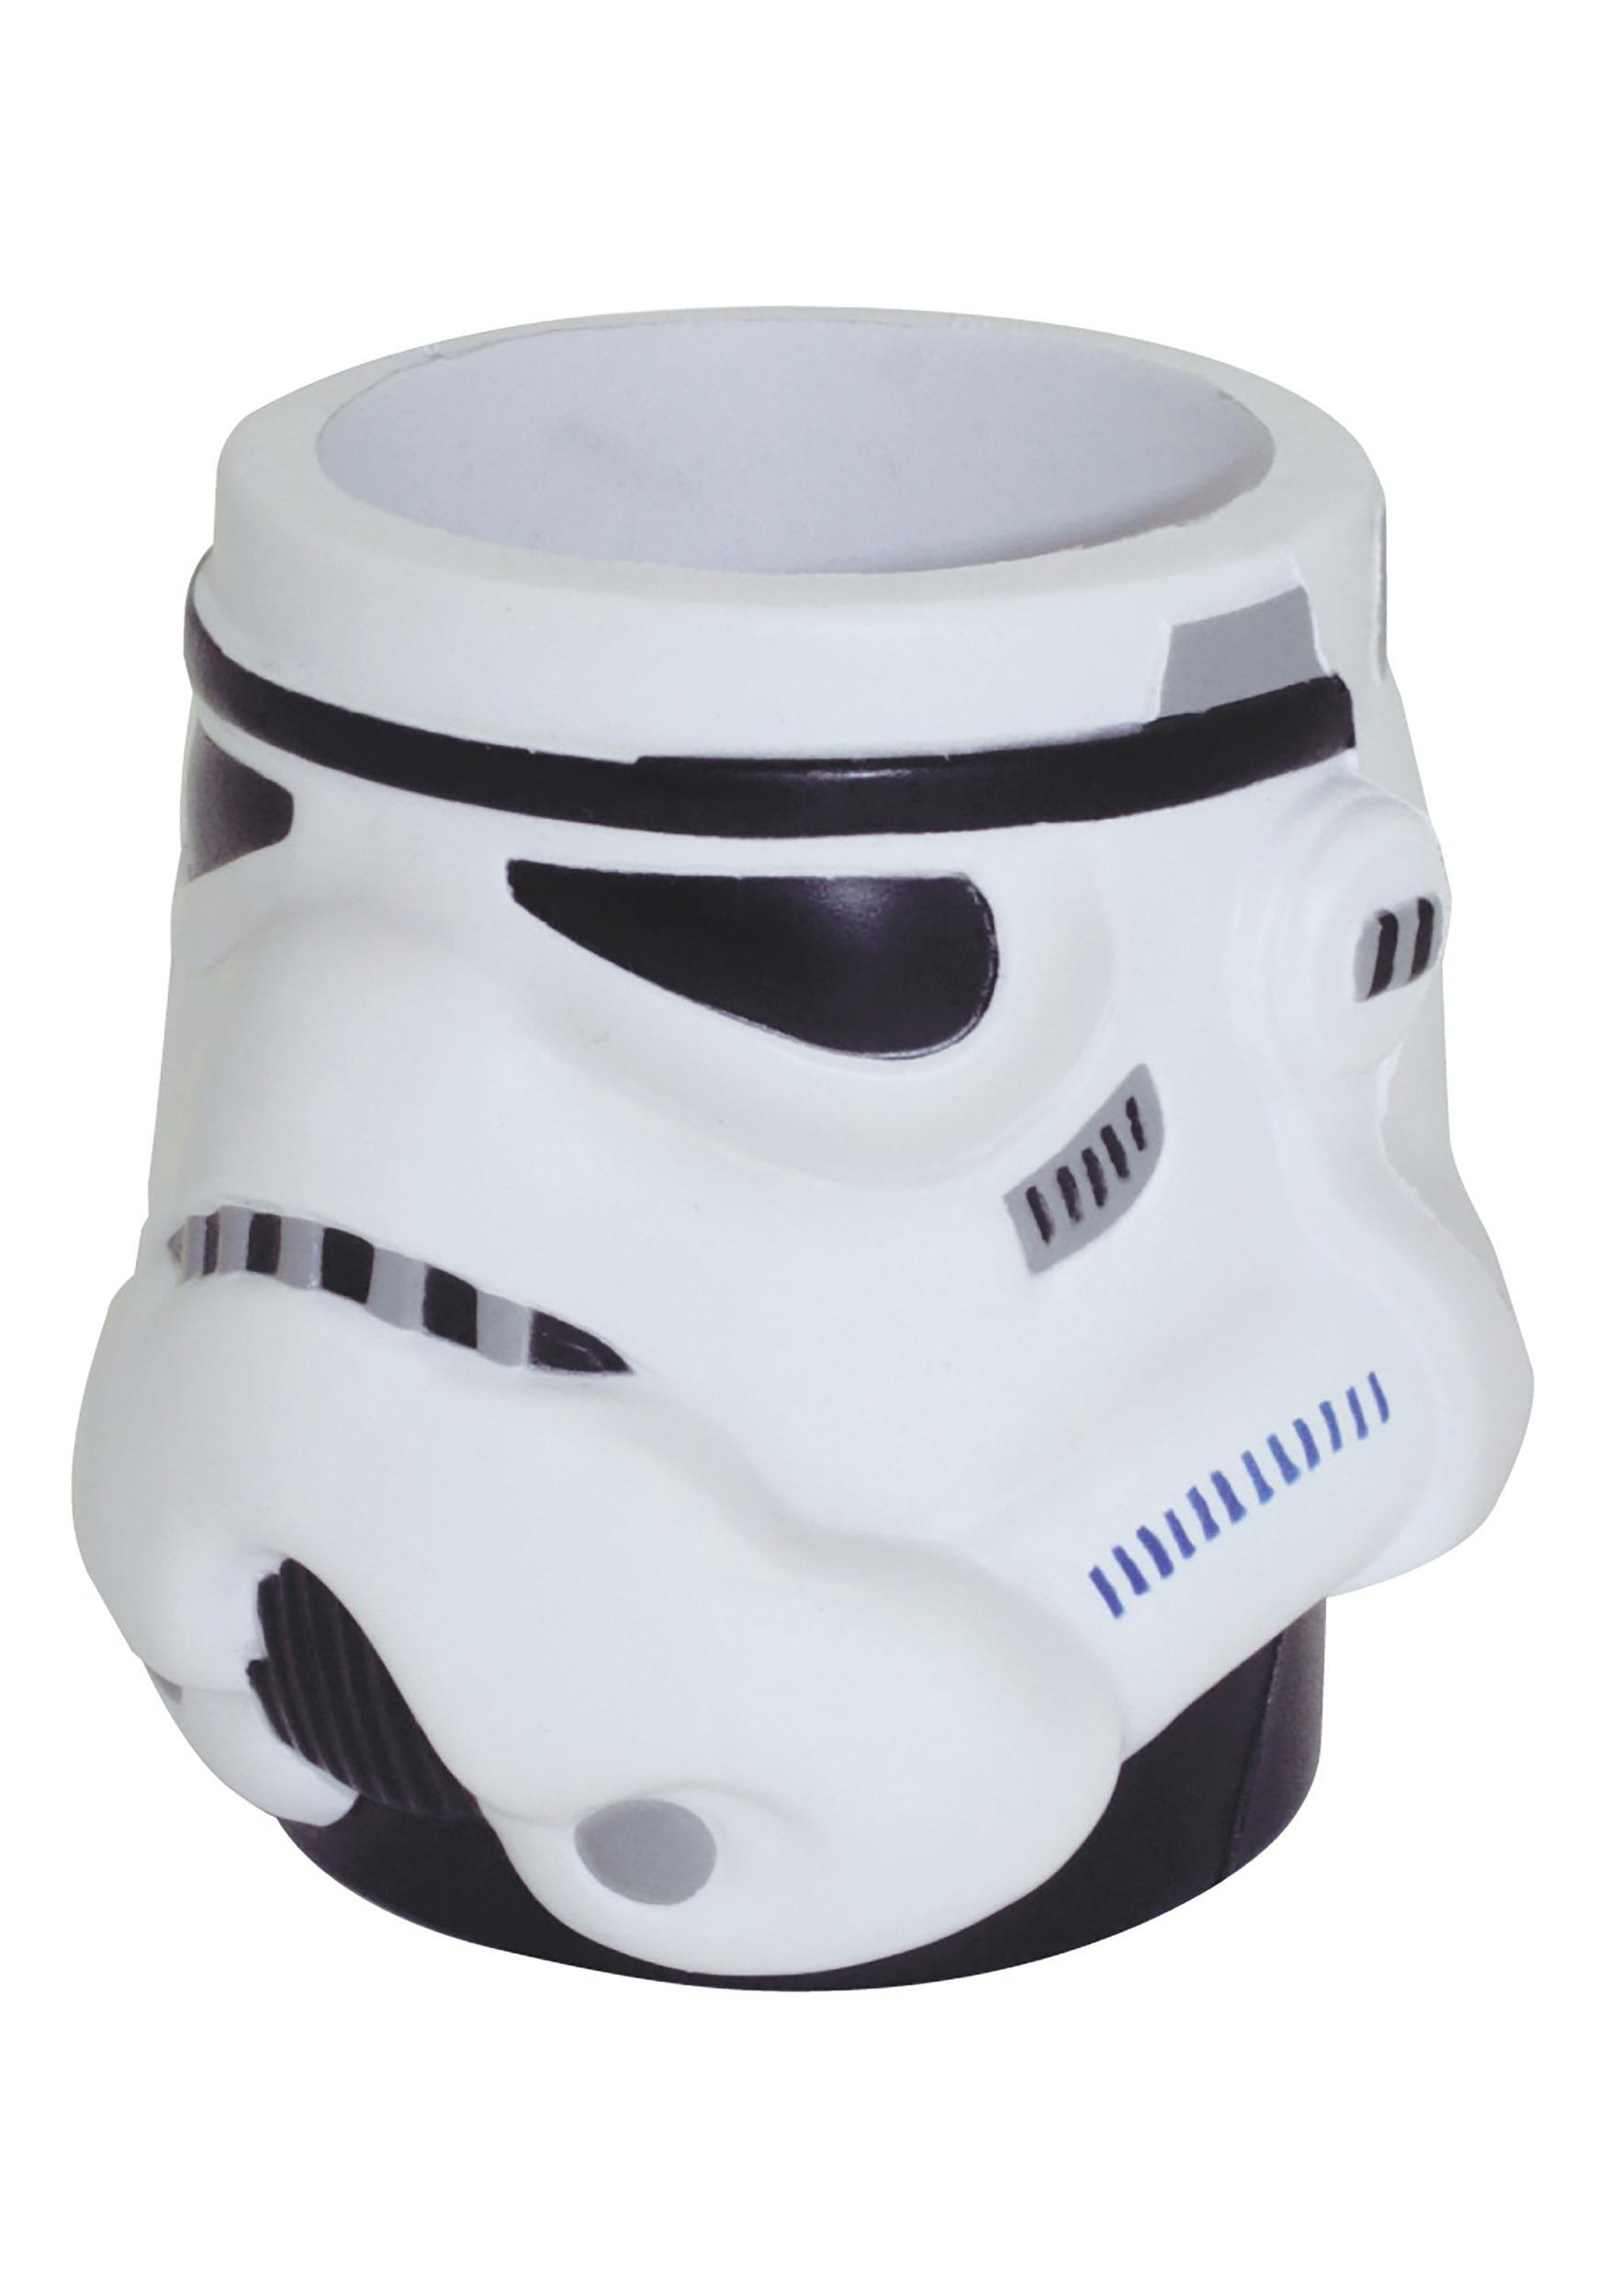 Star Wars Stormtrooper Foam Can Cooler ICU14002